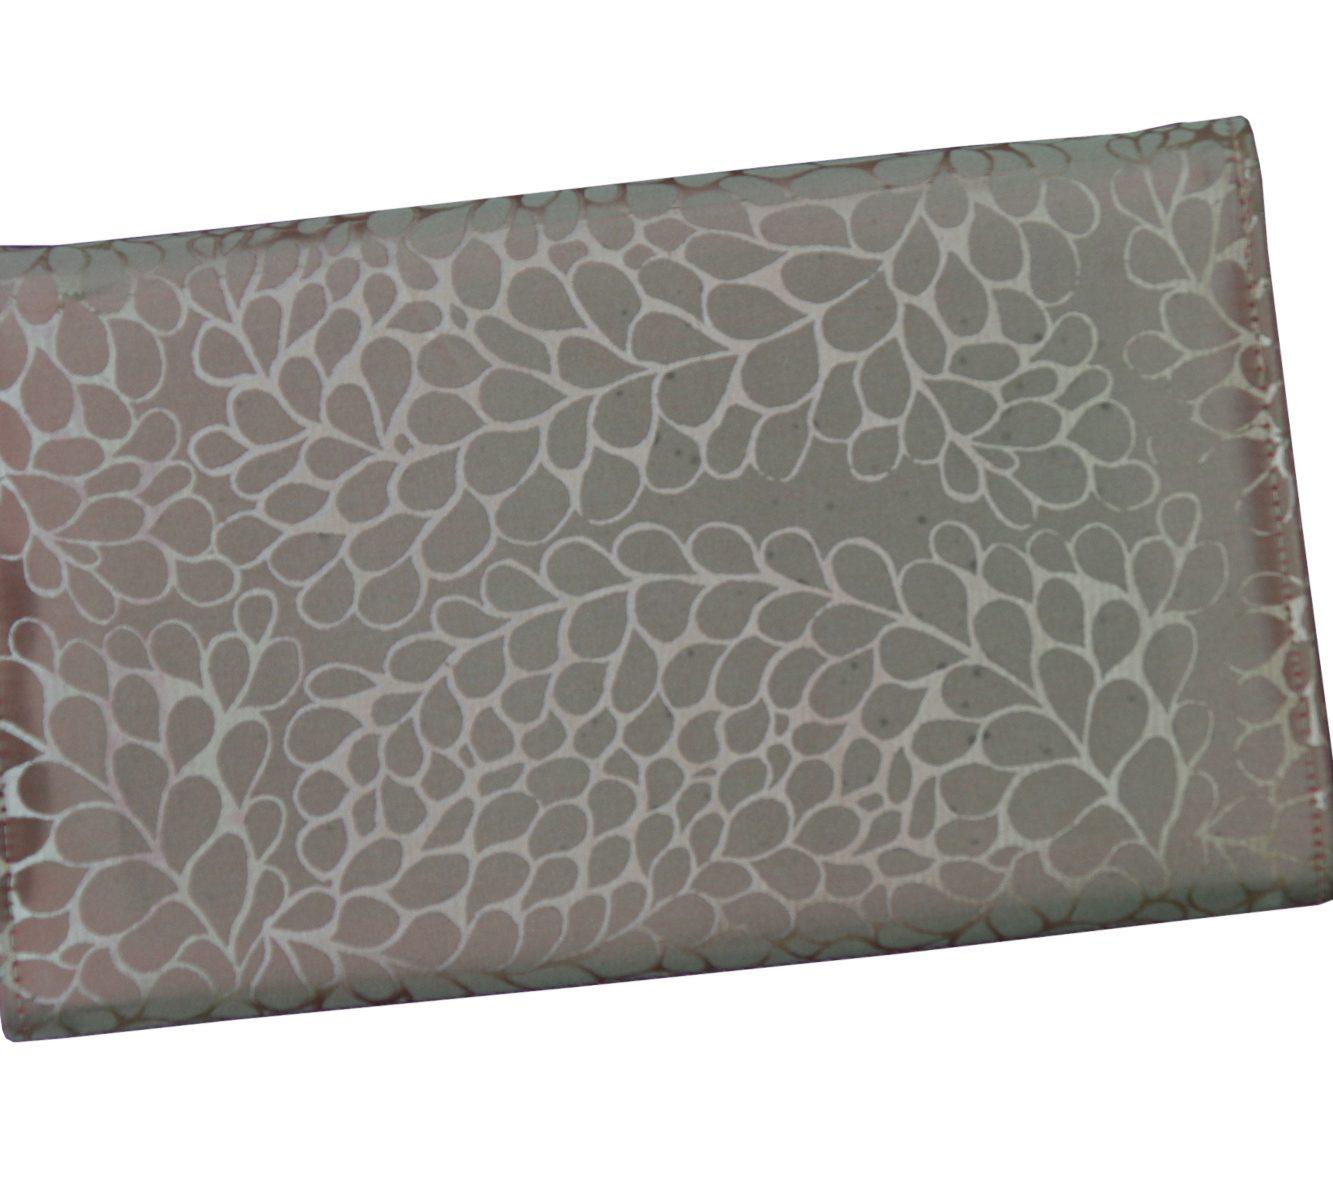 Taffeta silk evening clutch-6486